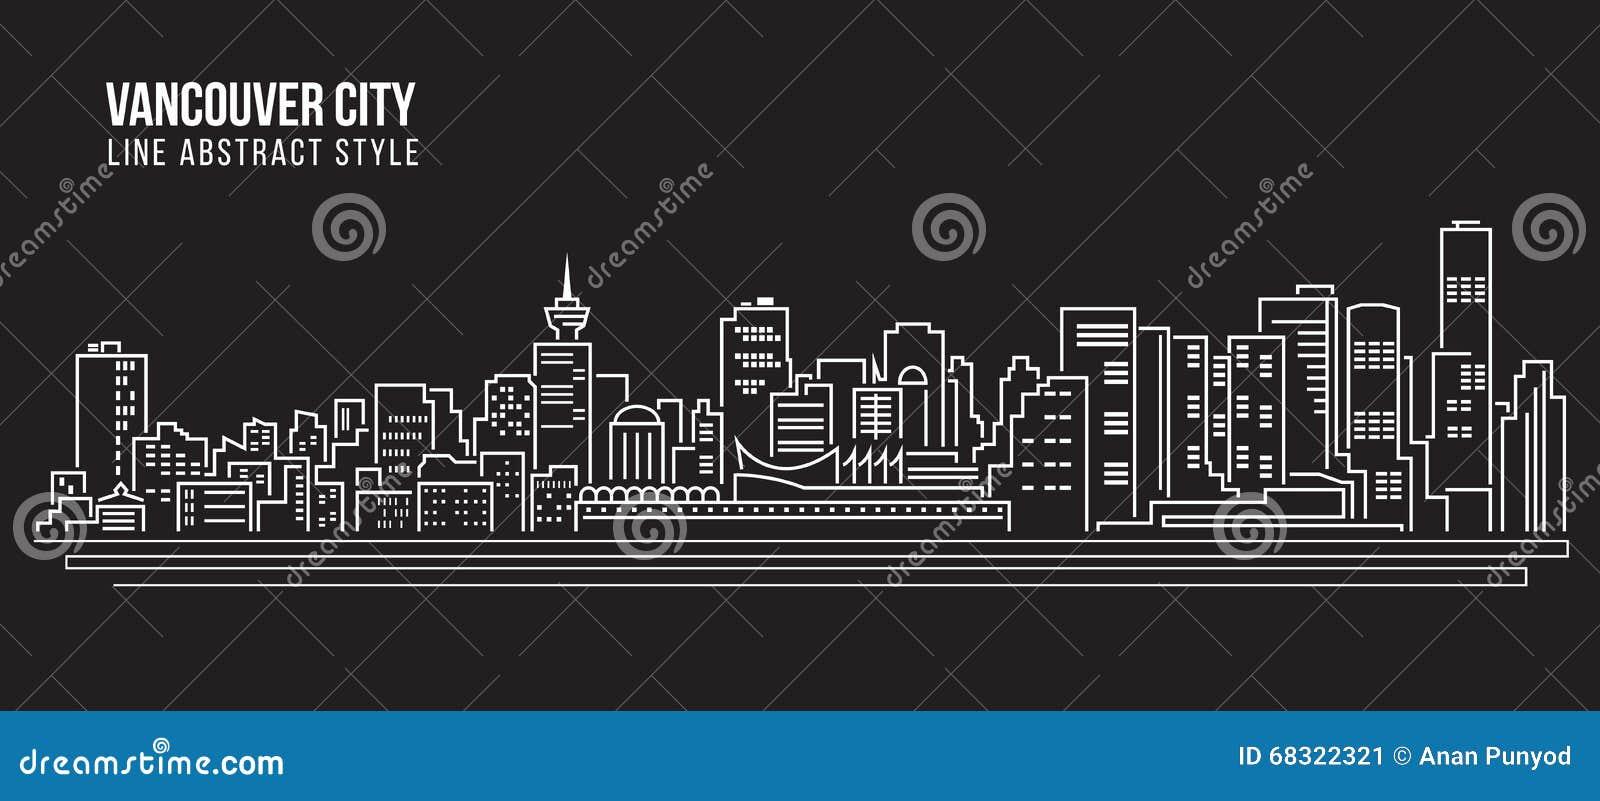 Cityscape Building Line Art Vector Illustration Design Vancouver City Stock Vector Image